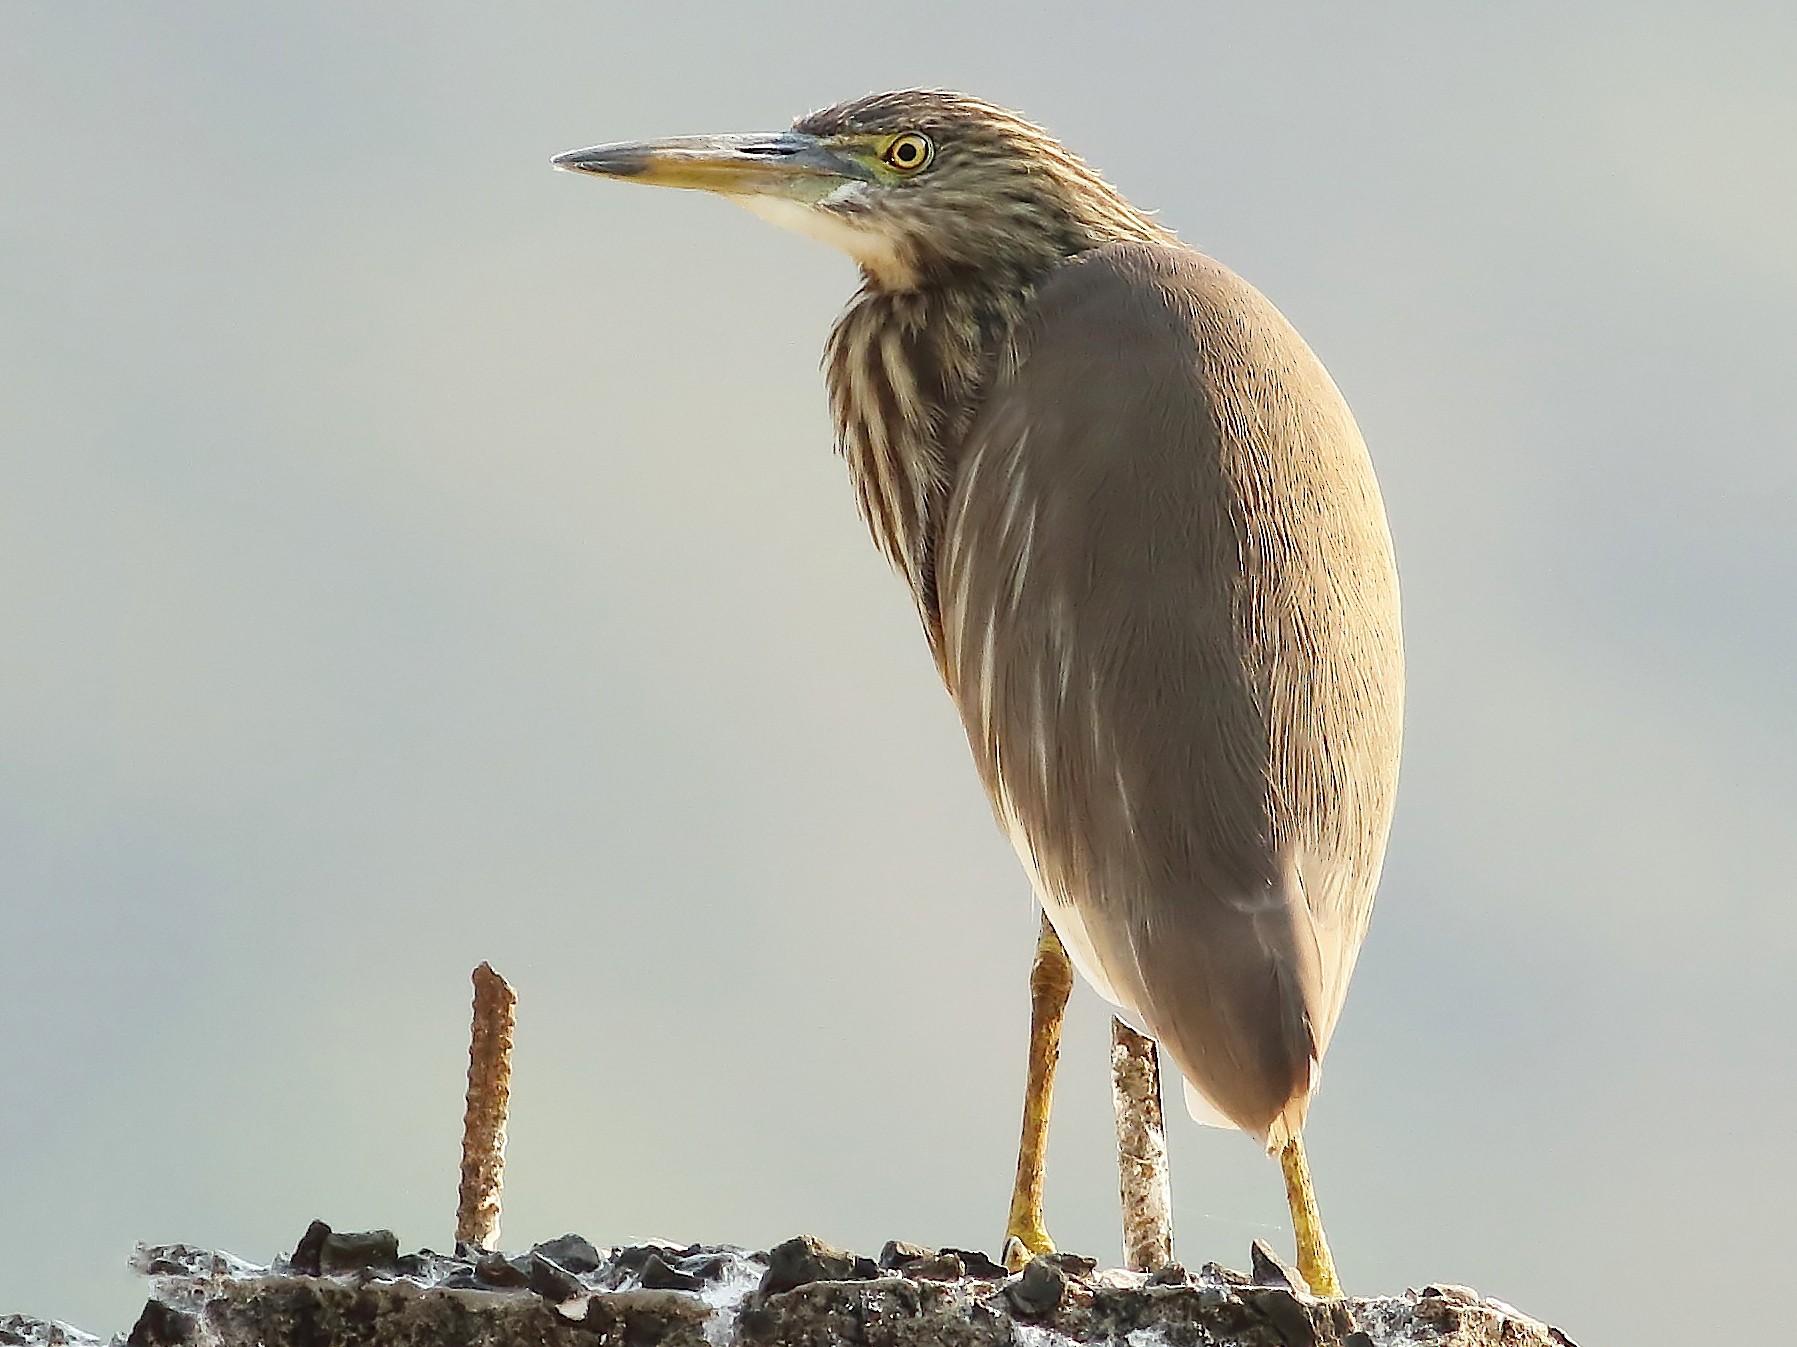 Indian Pond-Heron - Savio Fonseca (www.avocet-peregrine.com)